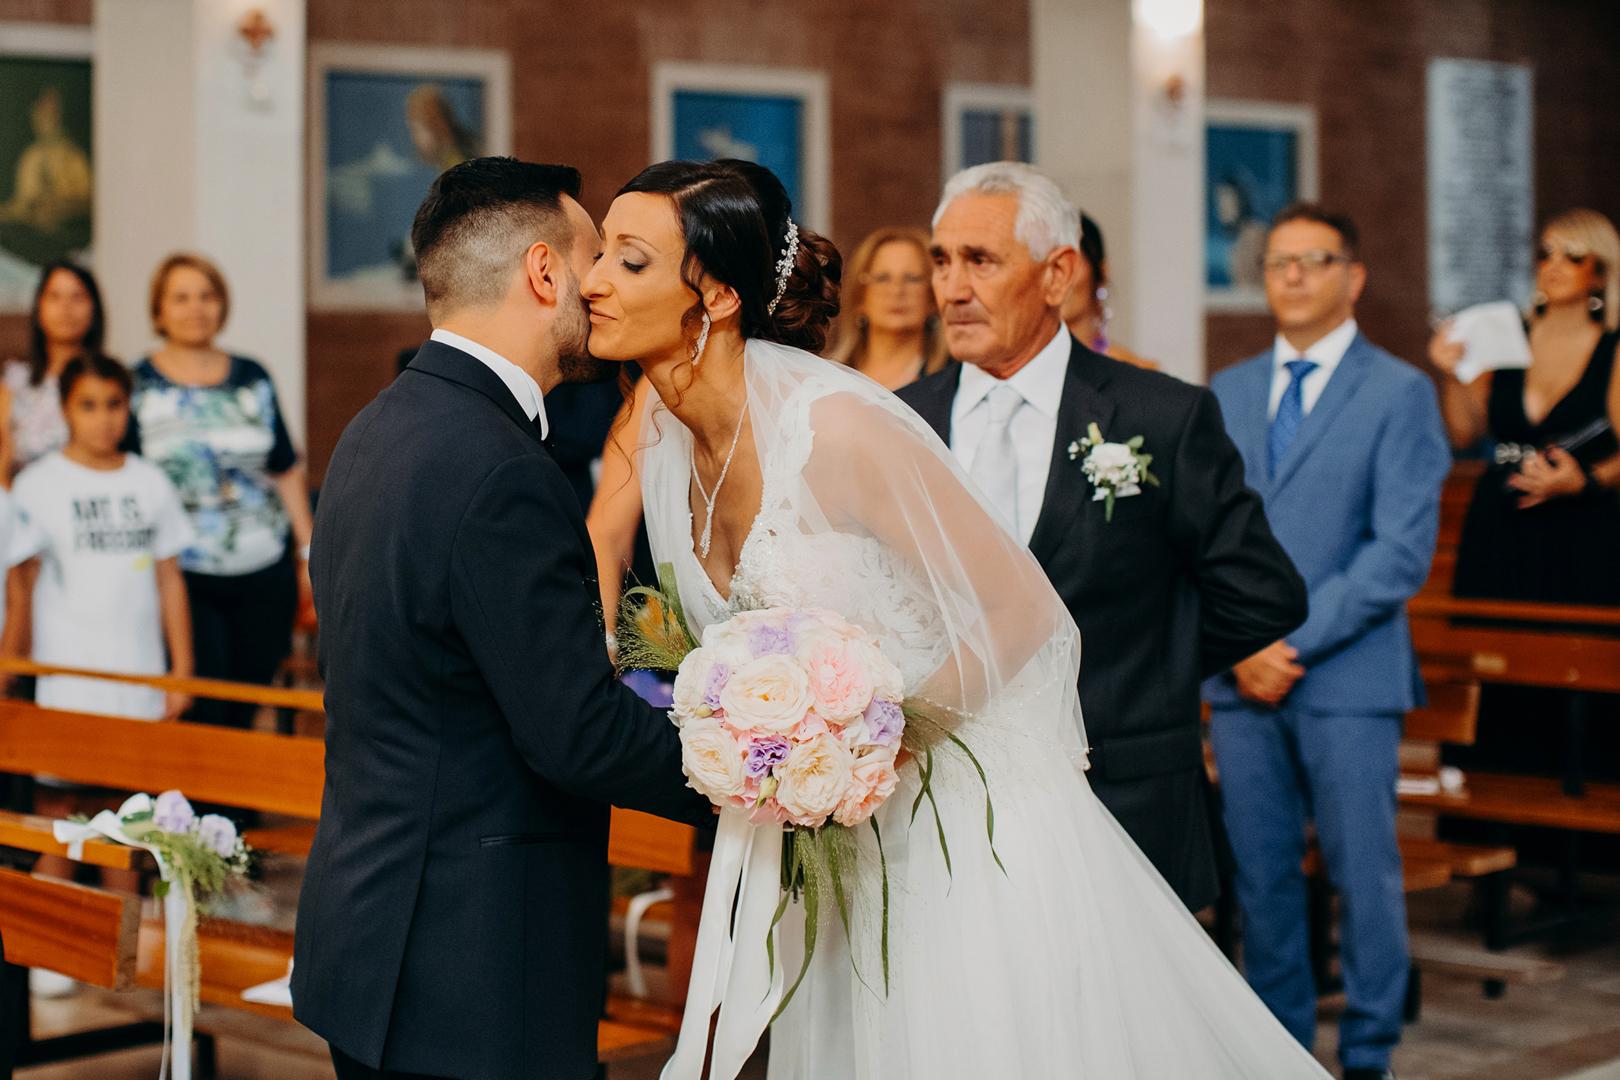 11 gianni-lepopre-fotografo-matrimoni-lucera-wedding-entrata-chiesa-church